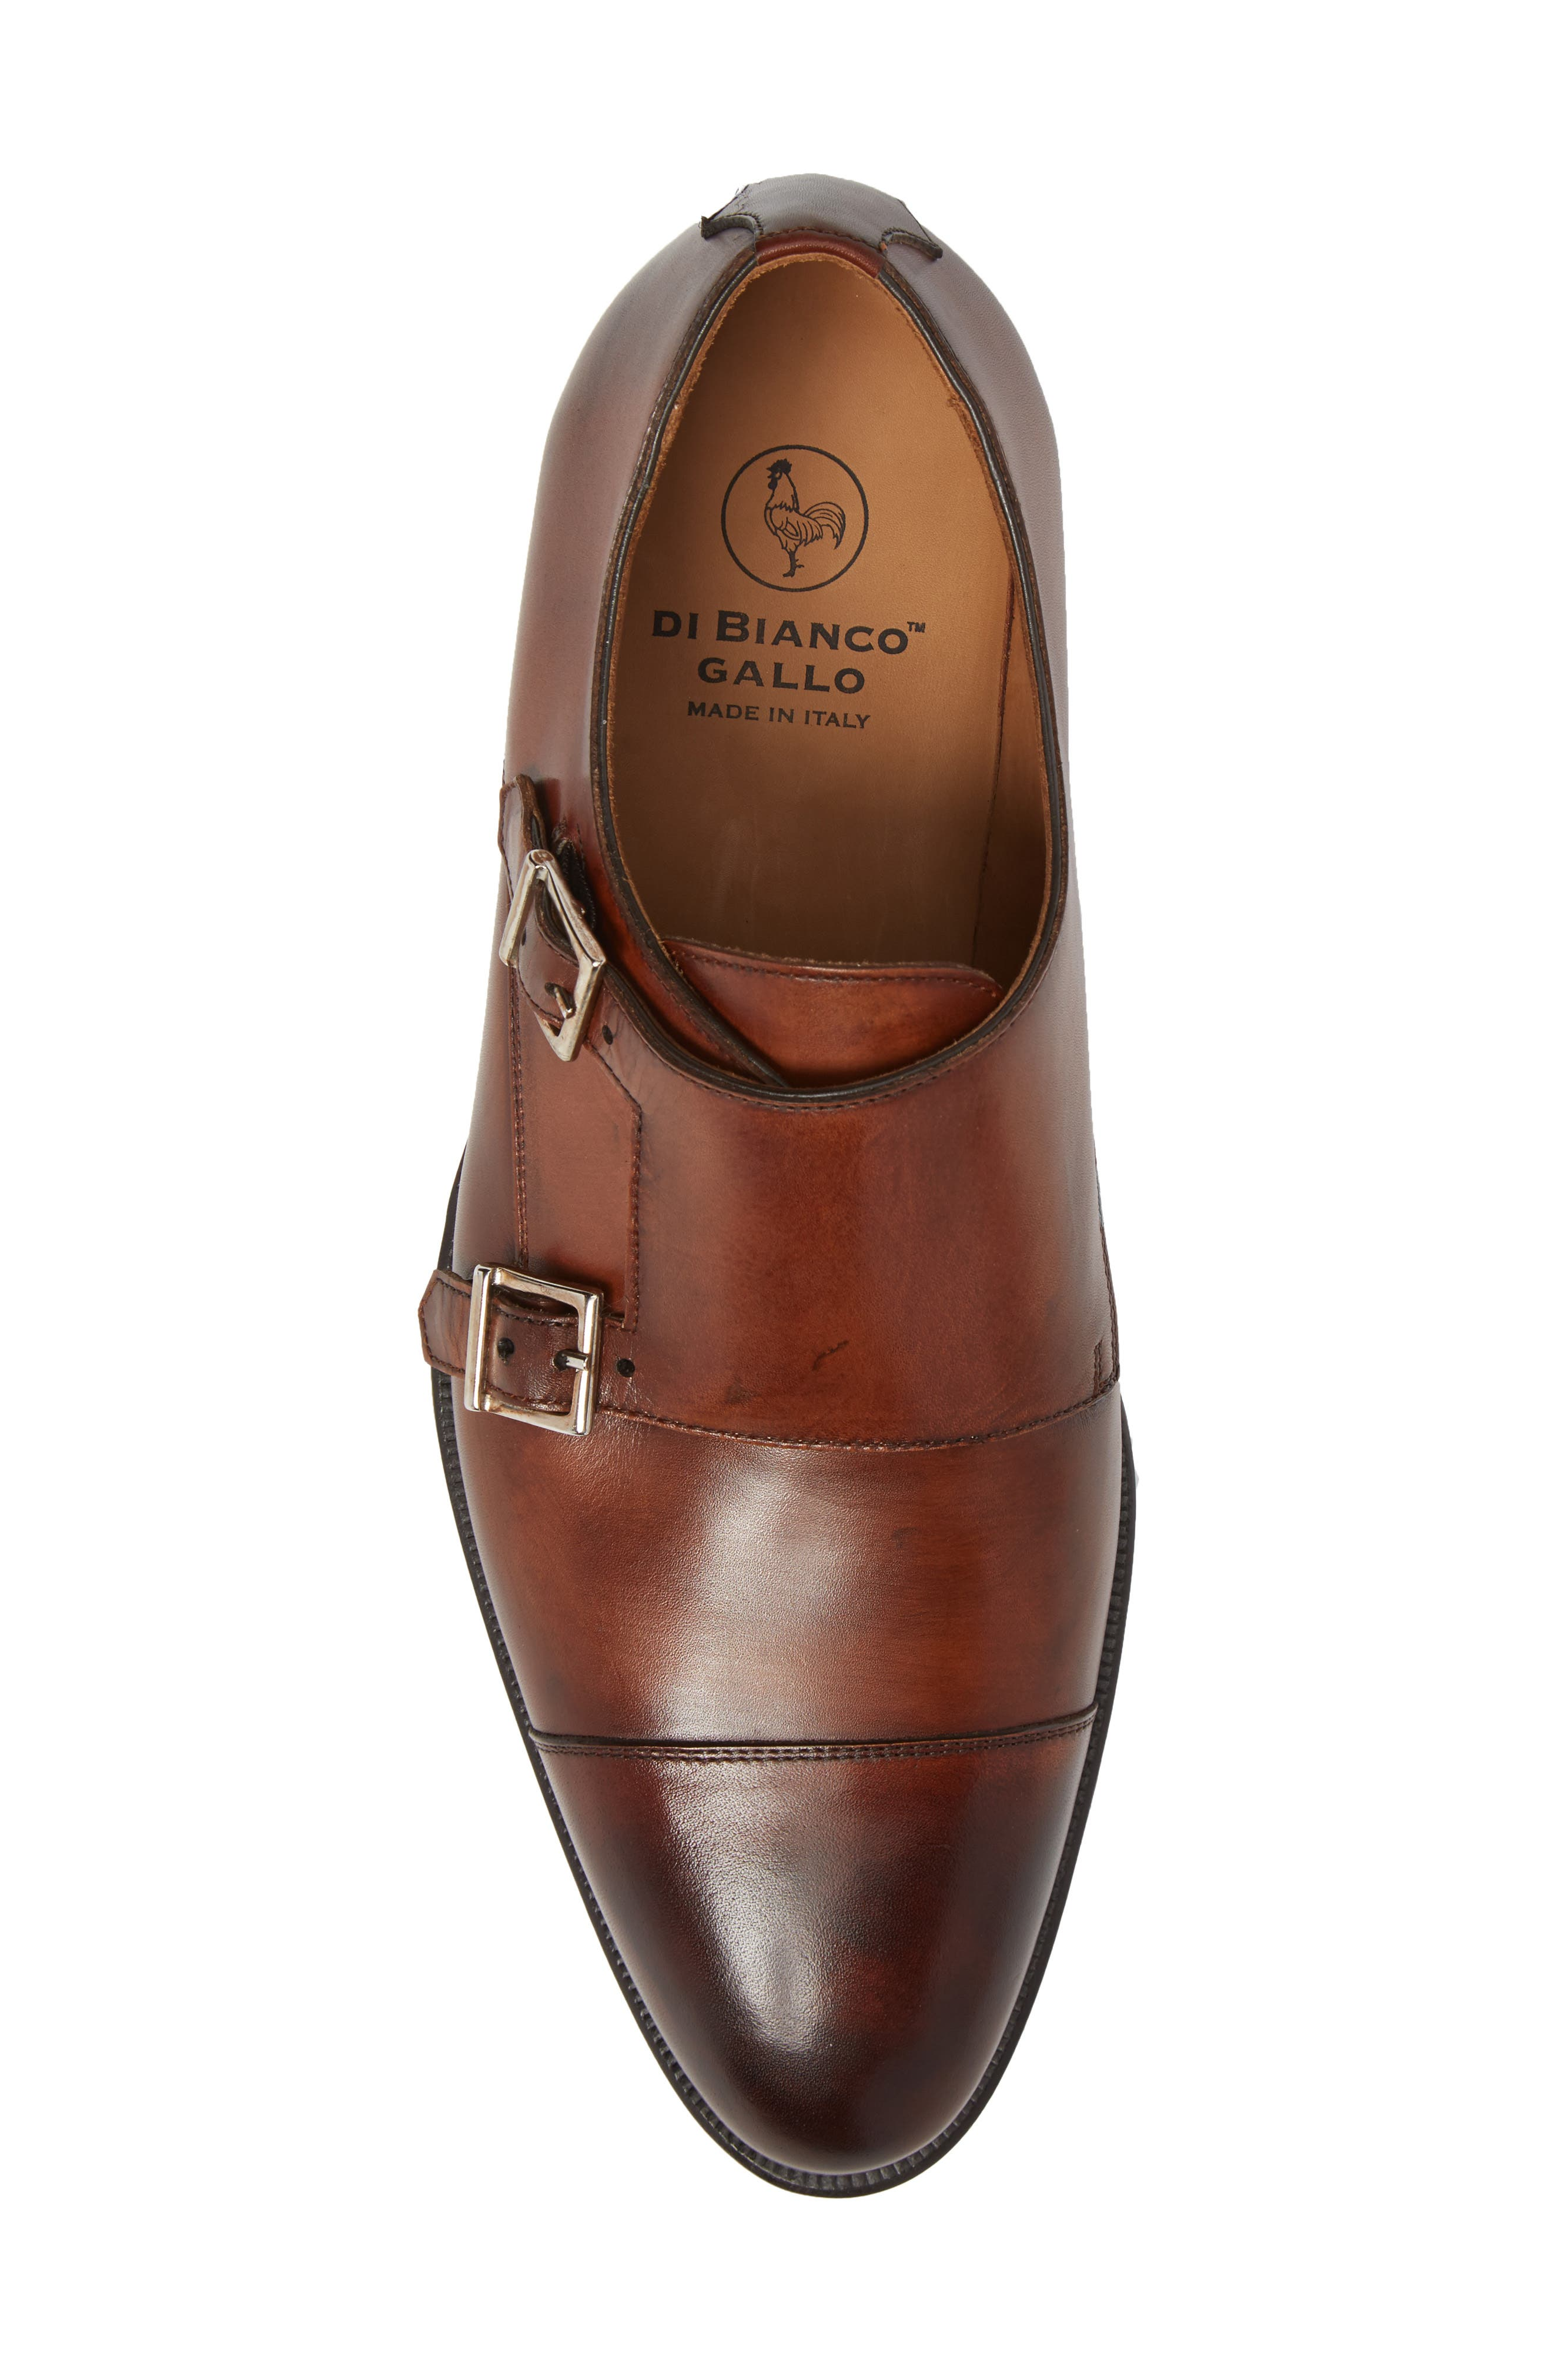 Gallo Bianco Double Monk Strap Shoe,                             Alternate thumbnail 5, color,                             201